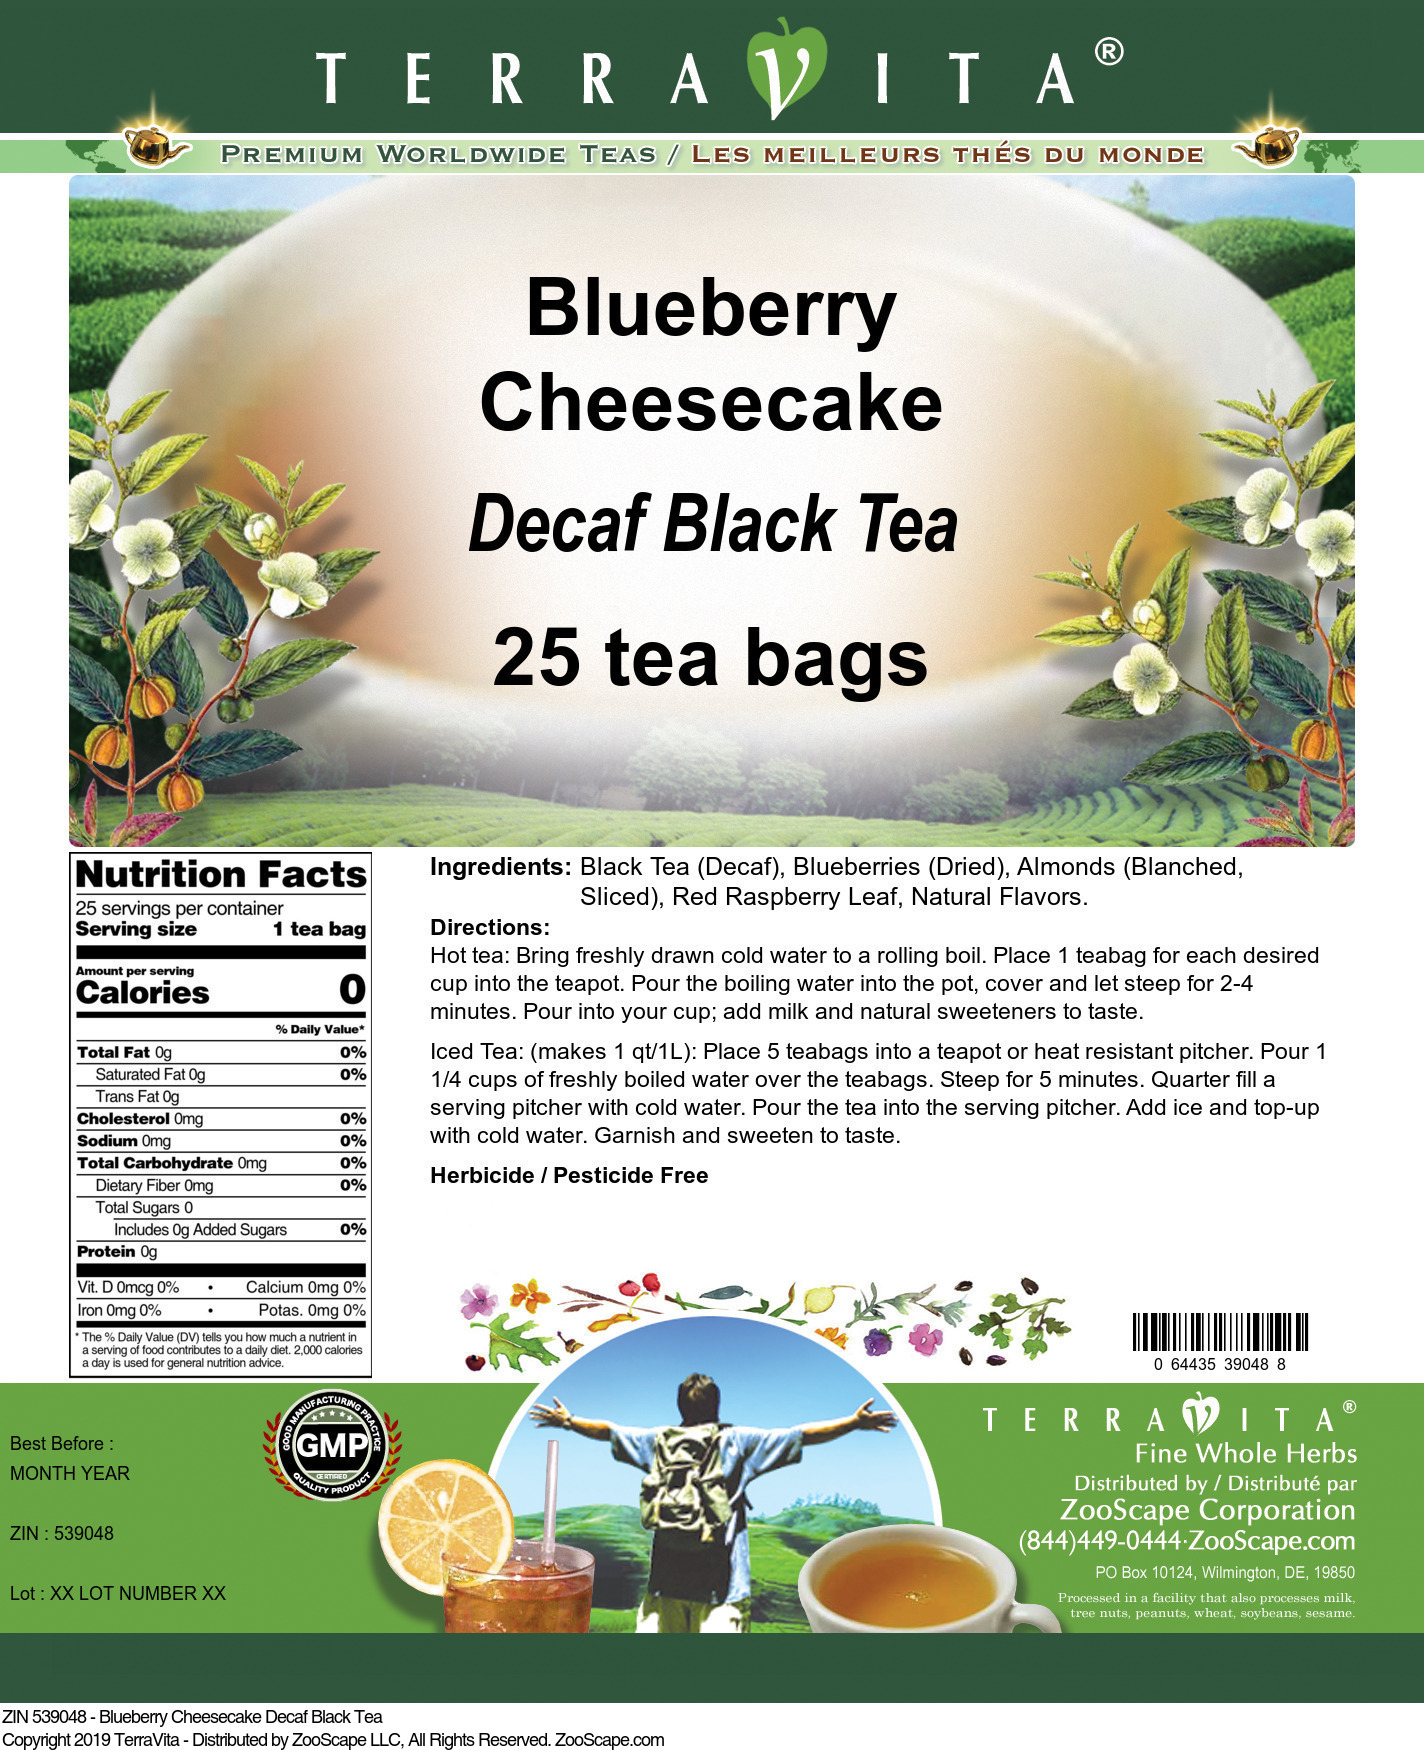 Blueberry Cheesecake Decaf Black Tea